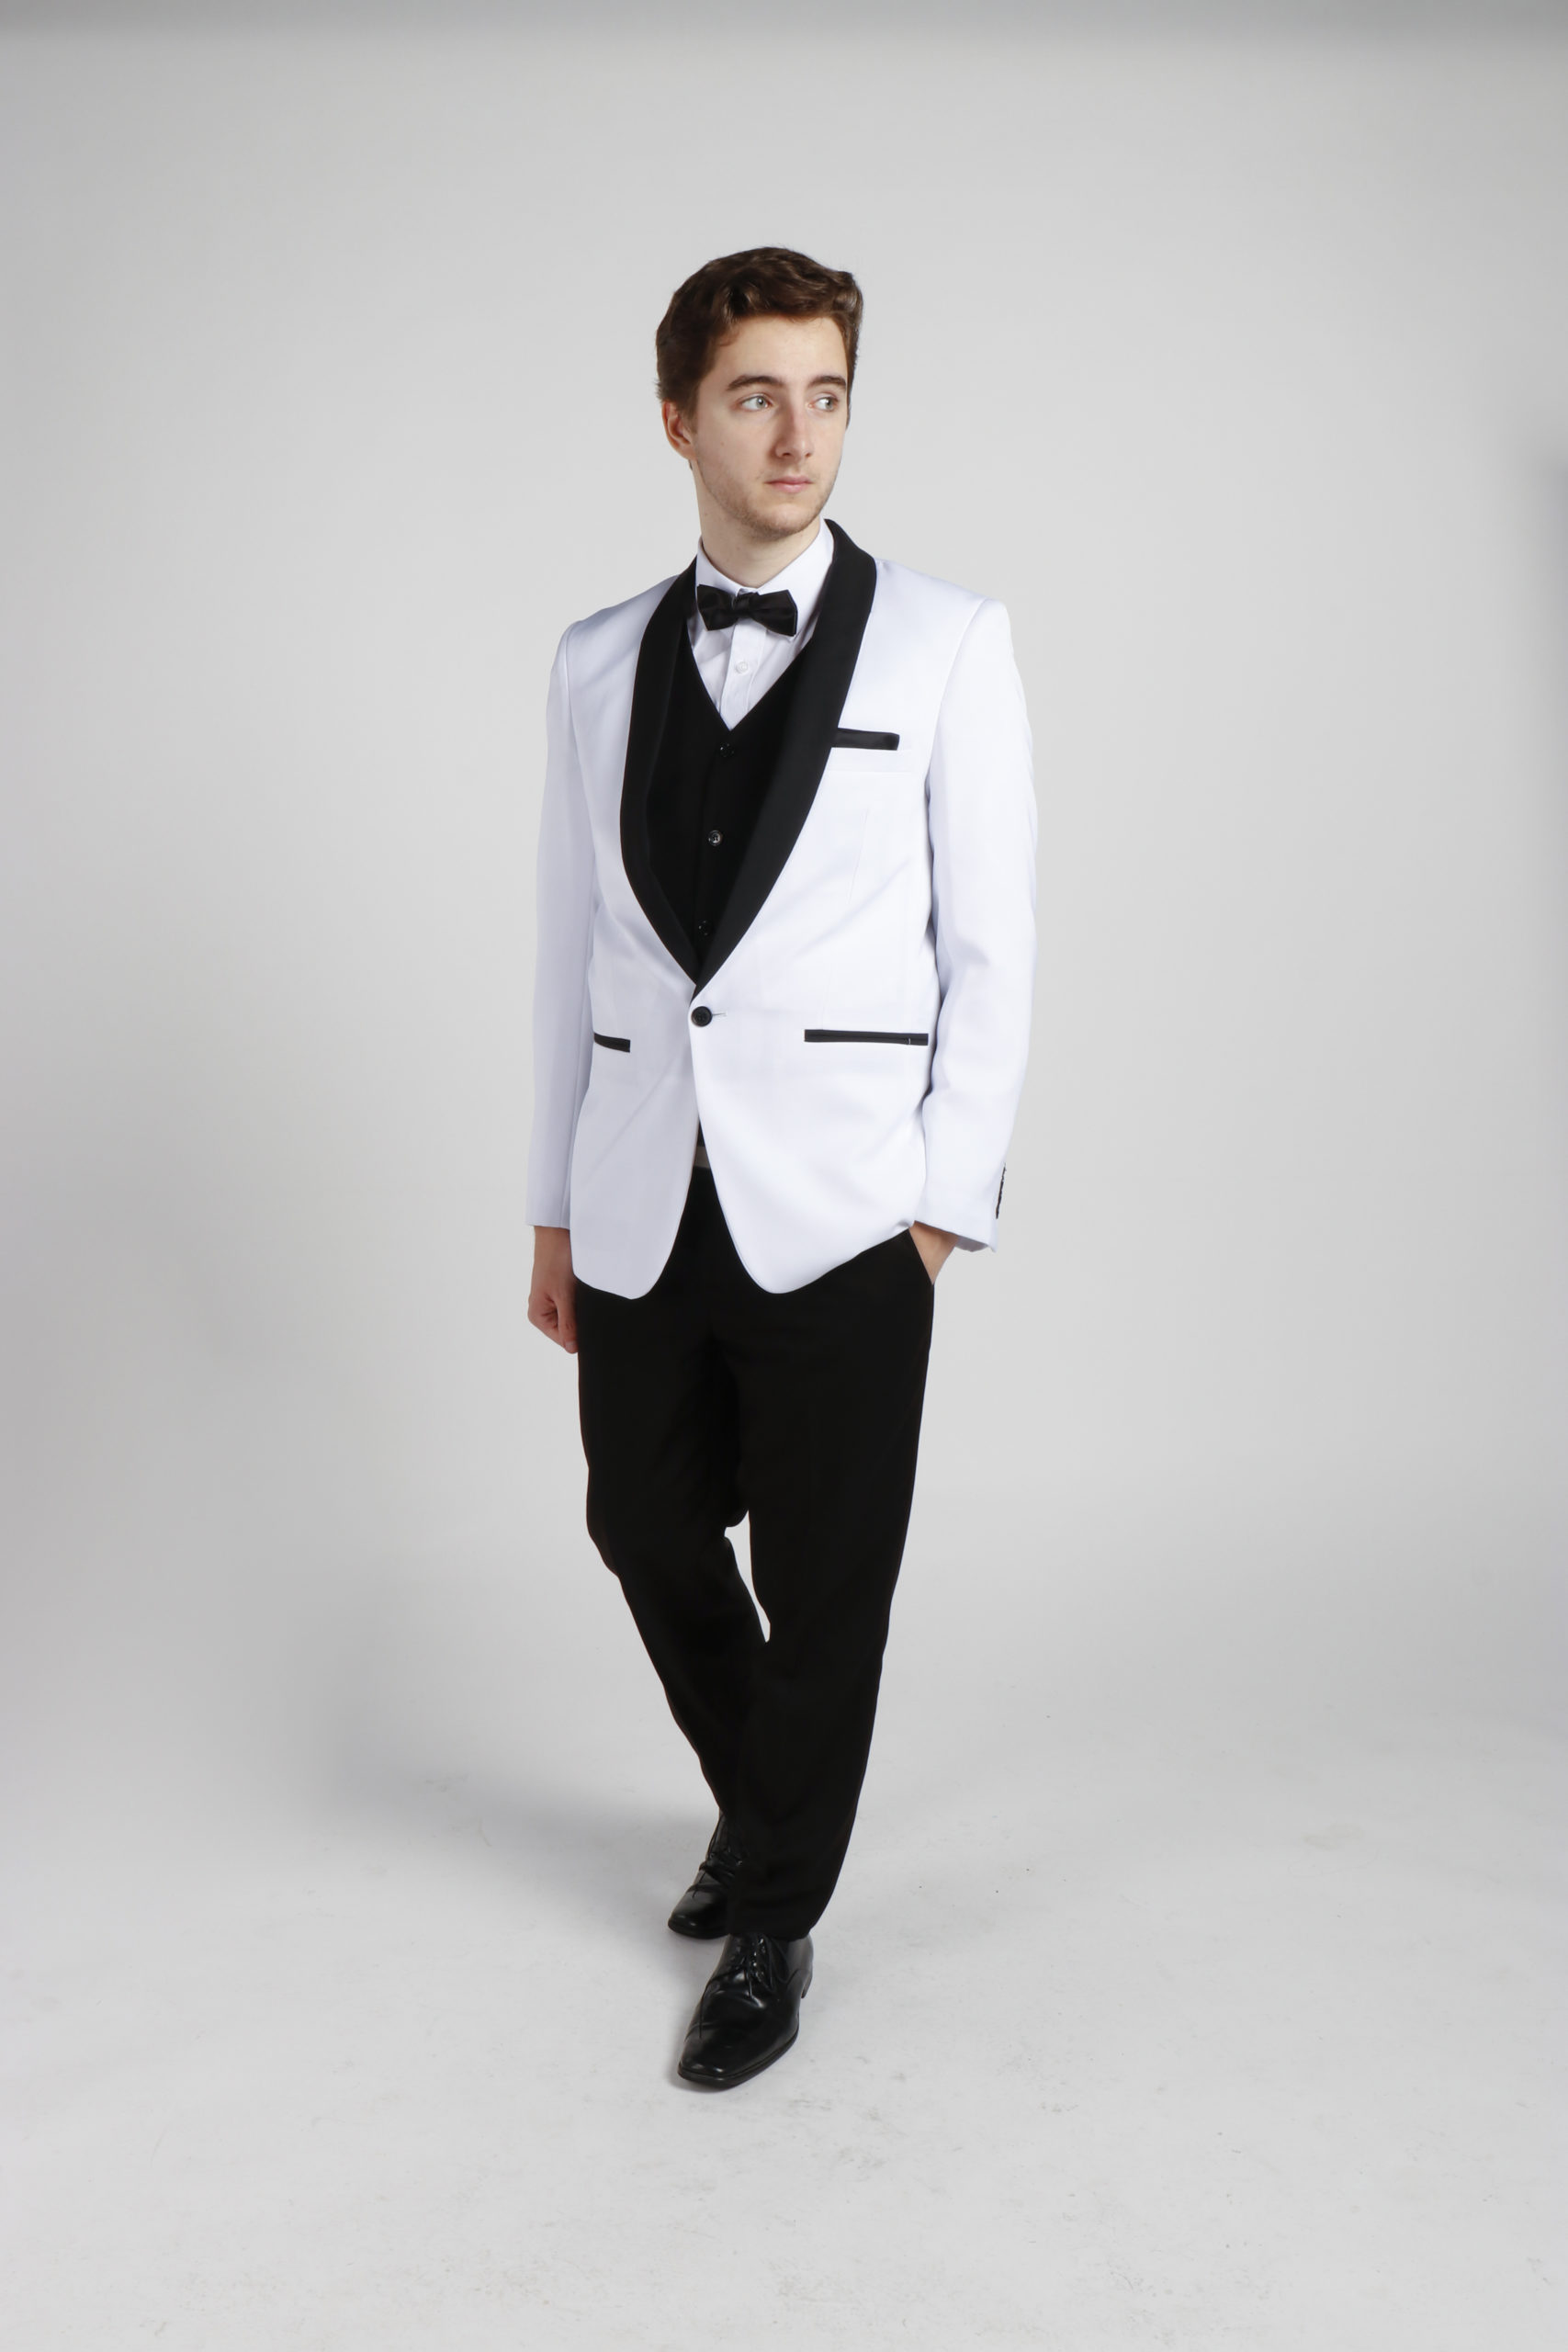 White Tuxedo with Black Lapels Hire